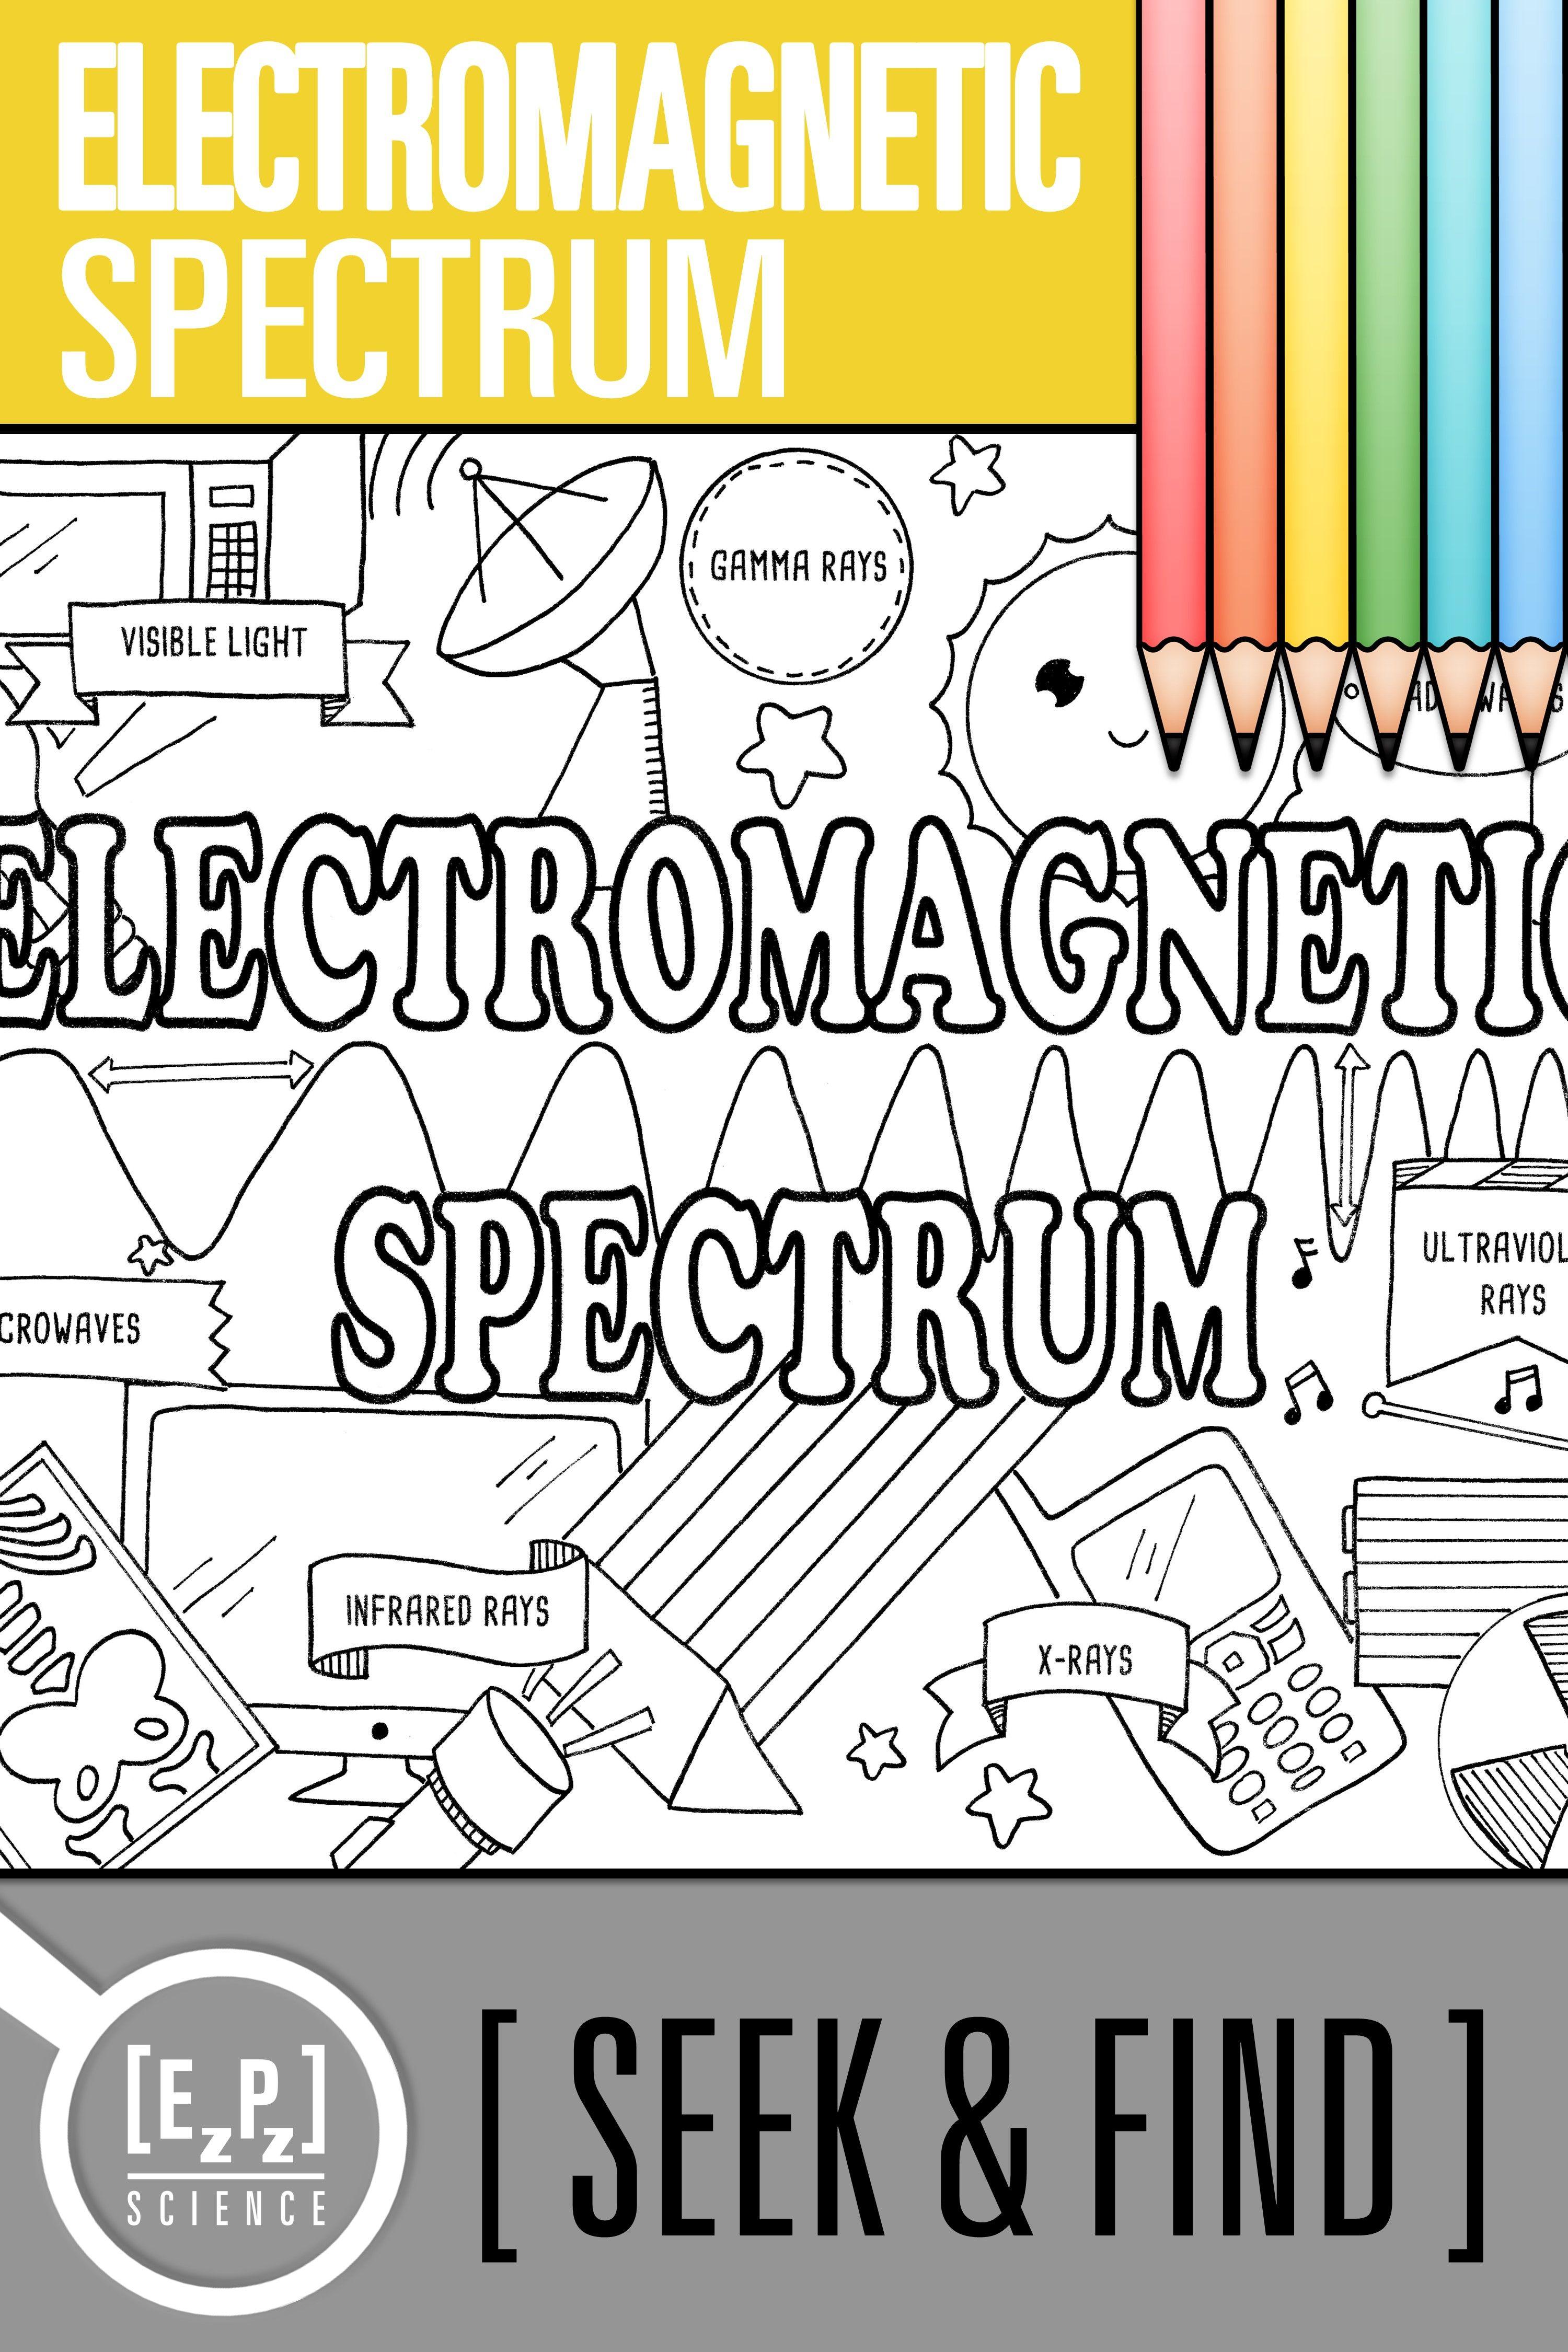 Visible Spectrum Worksheet